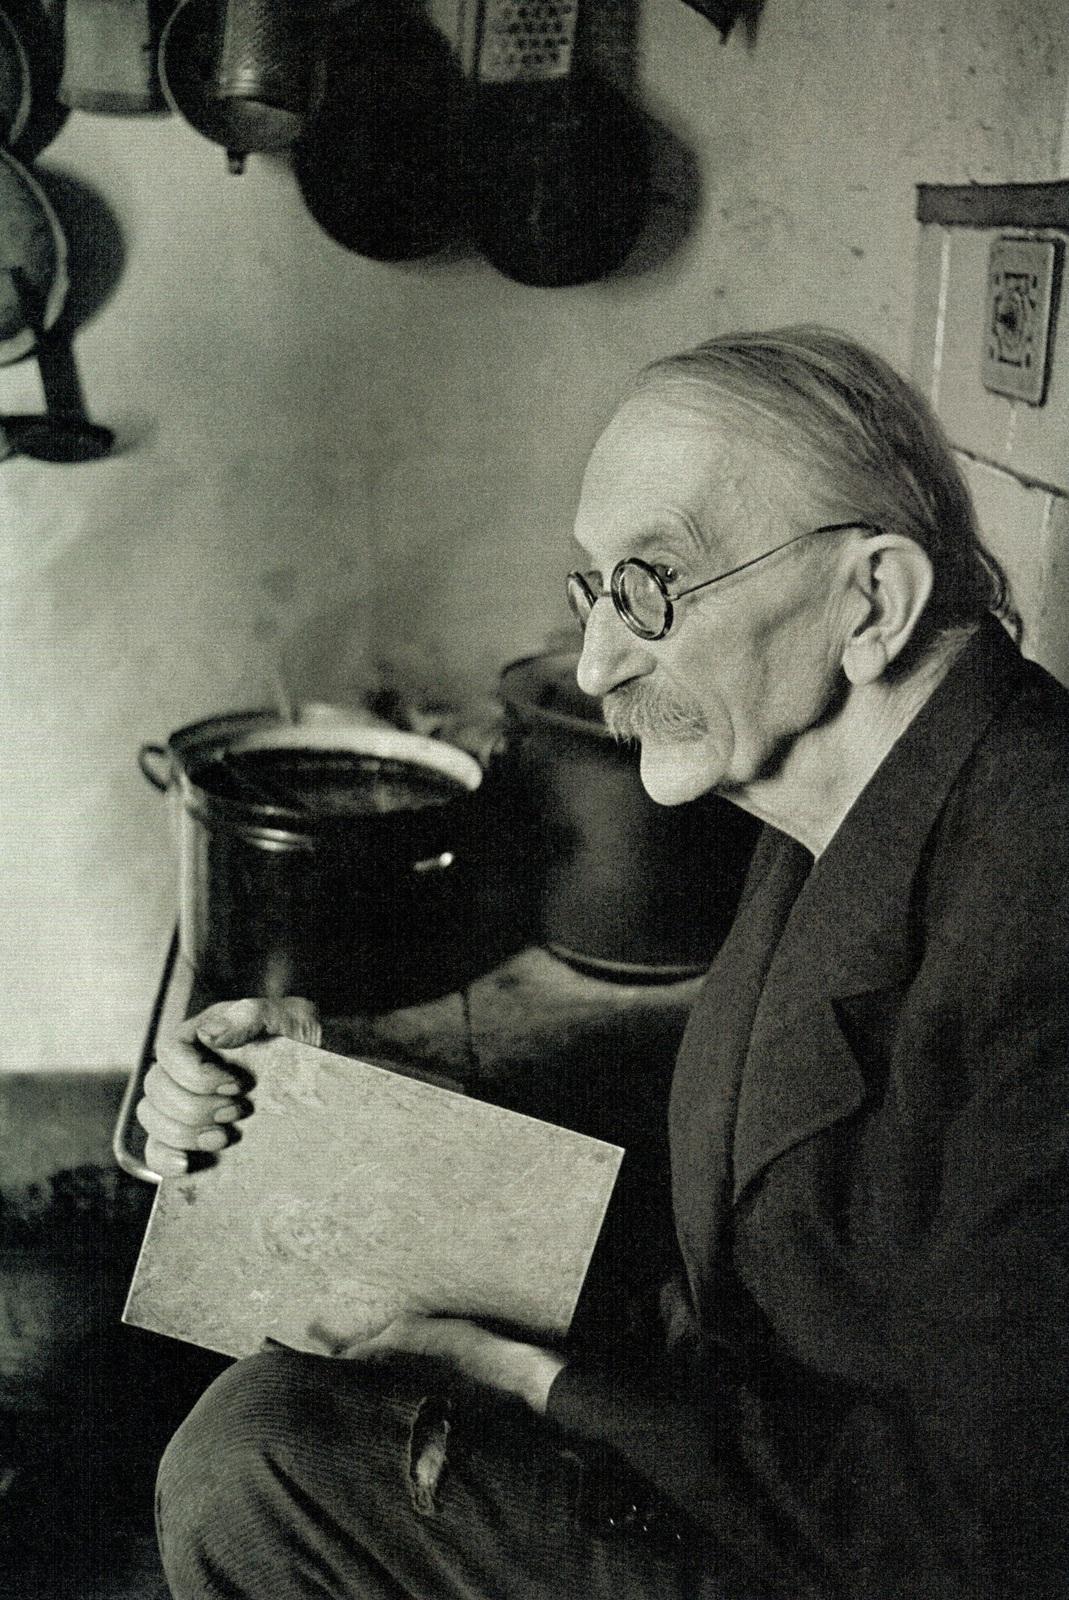 Reynek Bohuslav.jpg